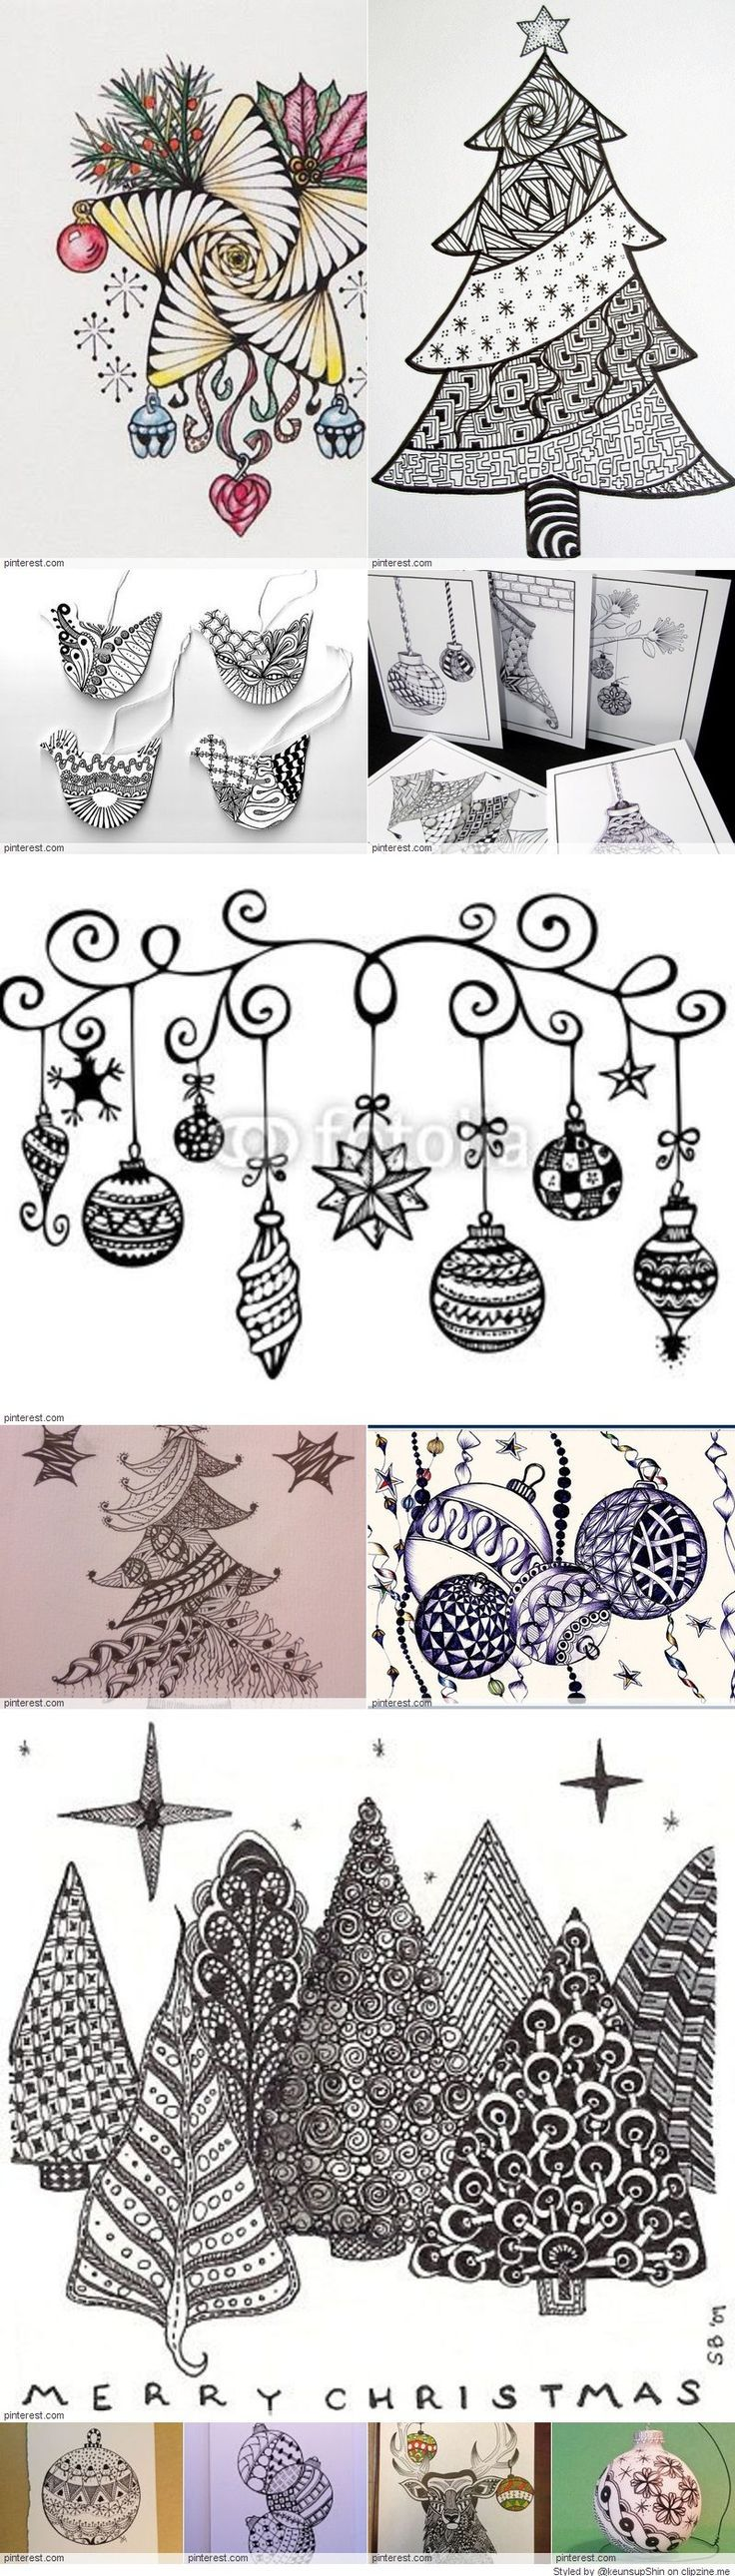 Christmas Zentangle Patterns #Arts Design